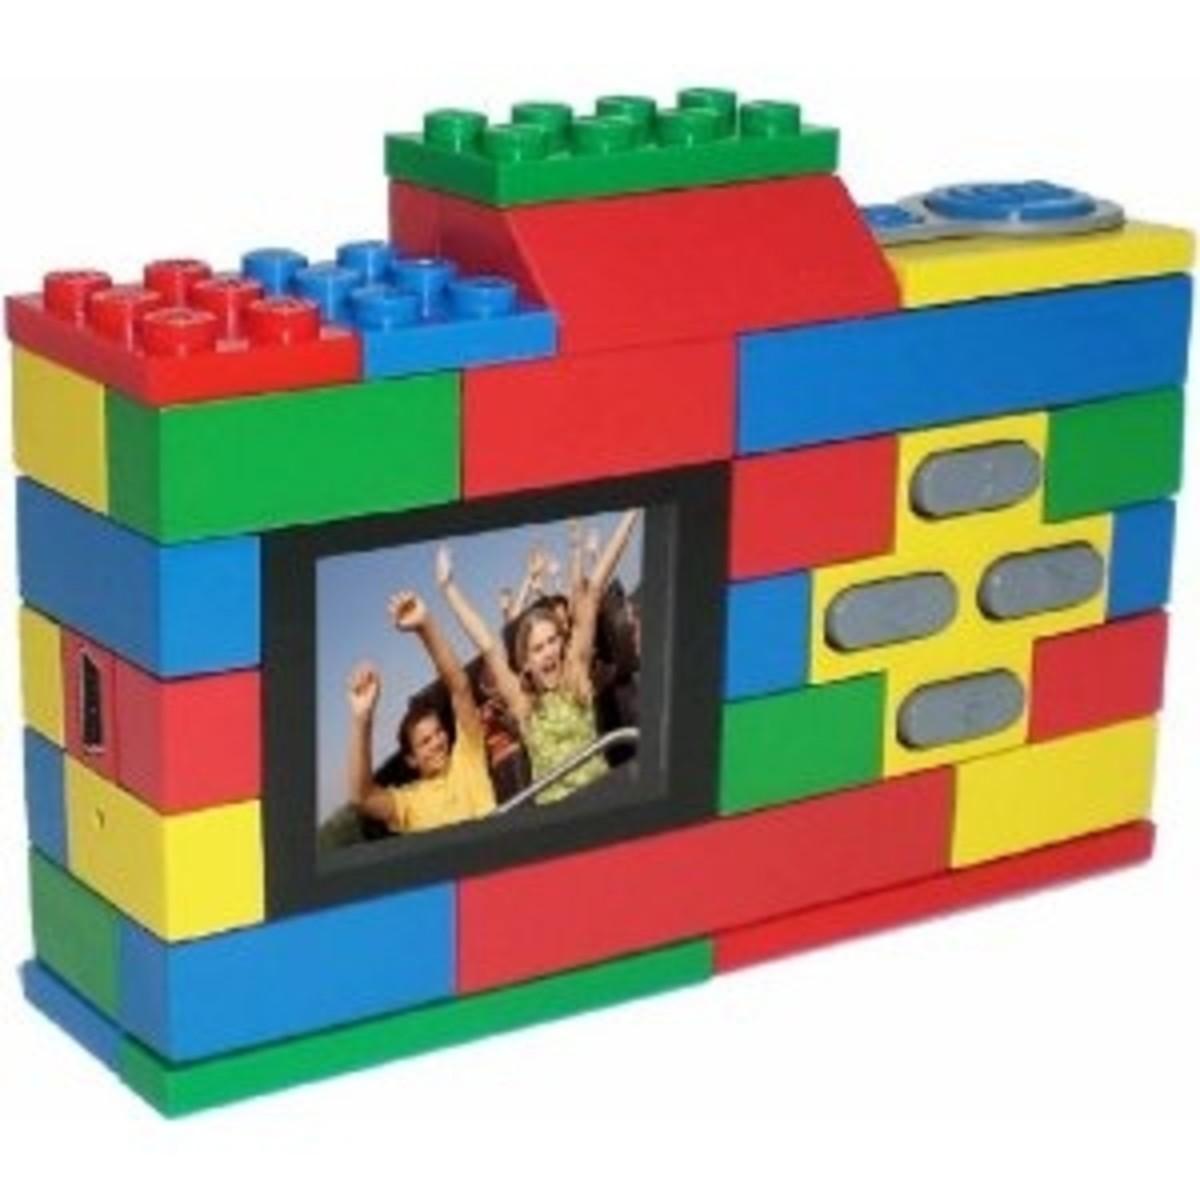 Lego digital camera rear view showing LCD screen